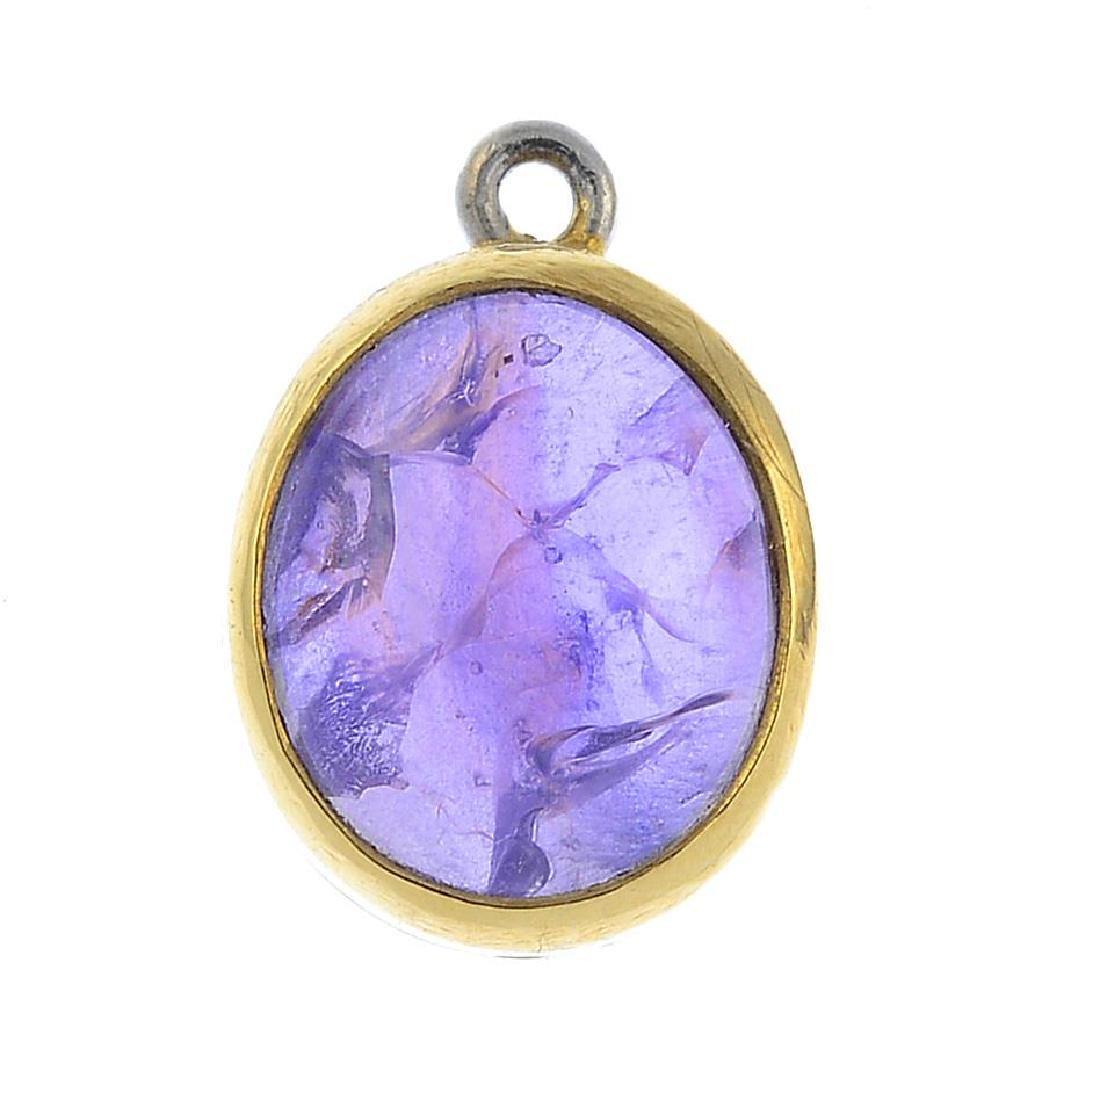 A star sapphire single-stone pendant. The oval purple